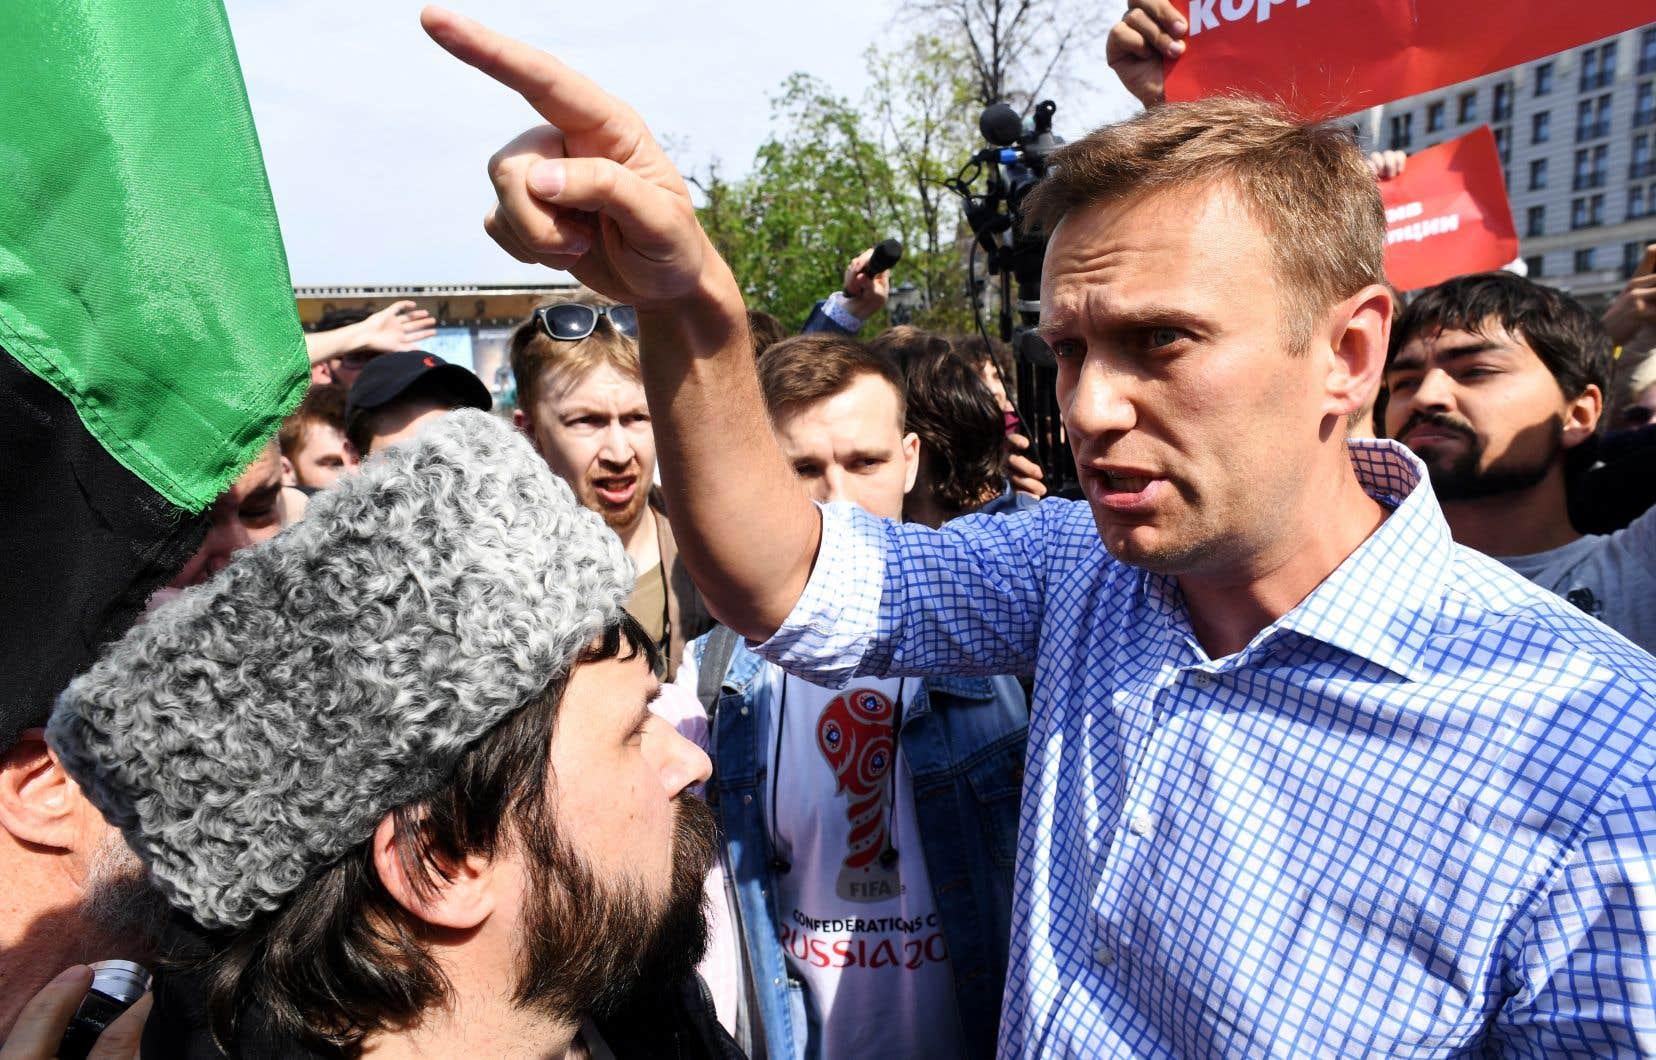 L'opposant russe Alexeï Navalny lors d'une manifestation en 2018